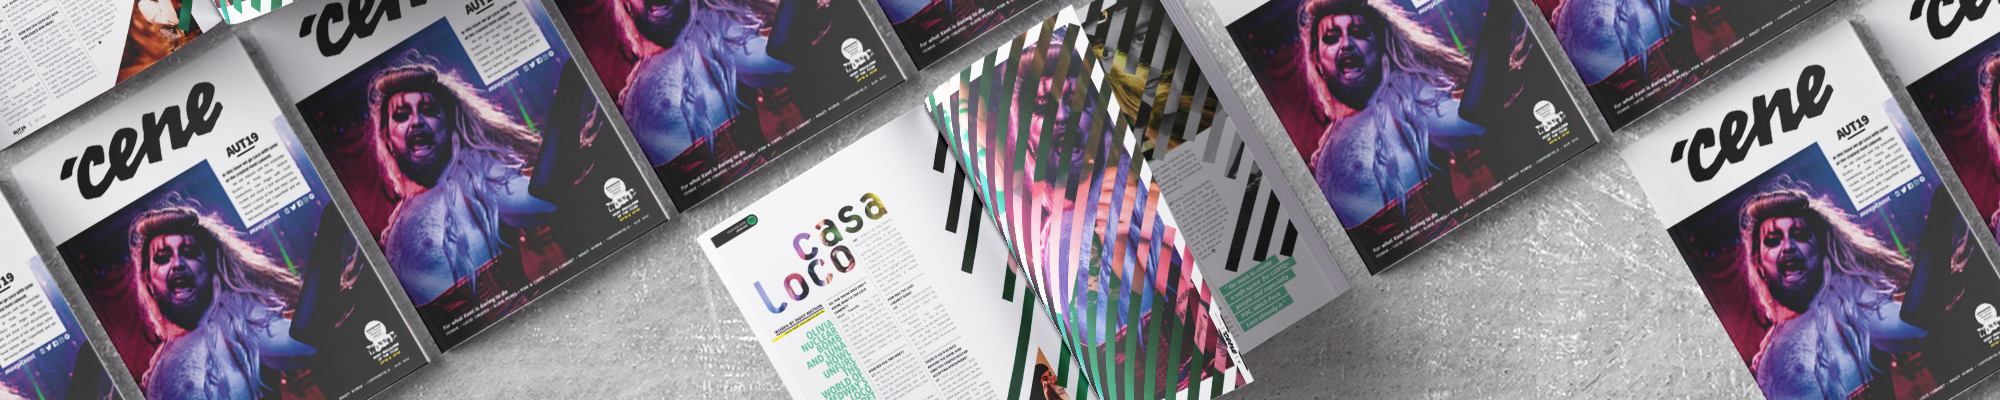 AUT19_cene-magazine_header-image-Web-main.jpg